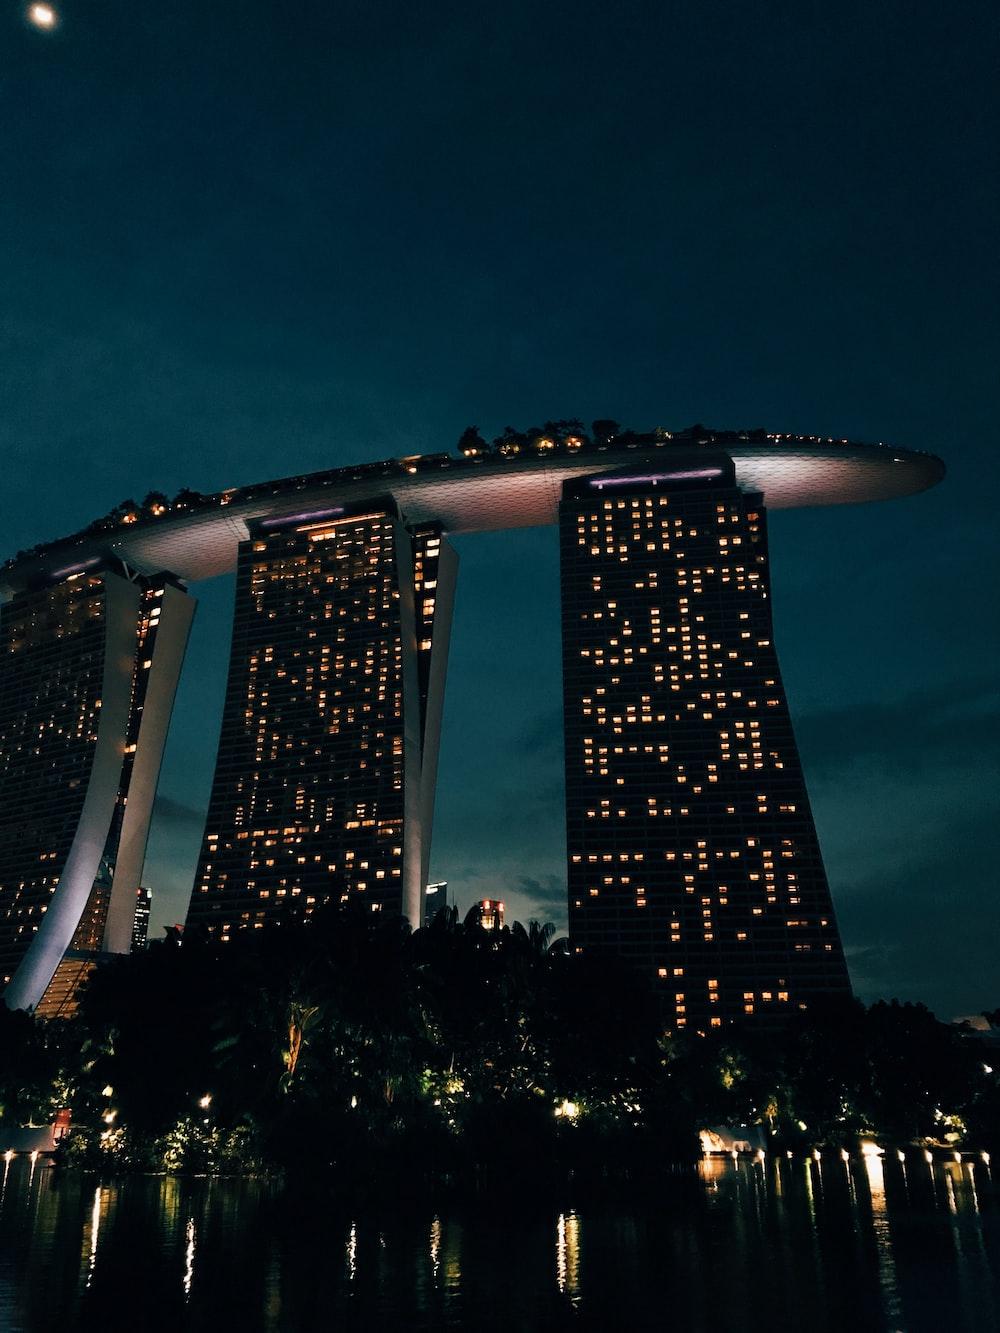 Marina Bay Sands during night